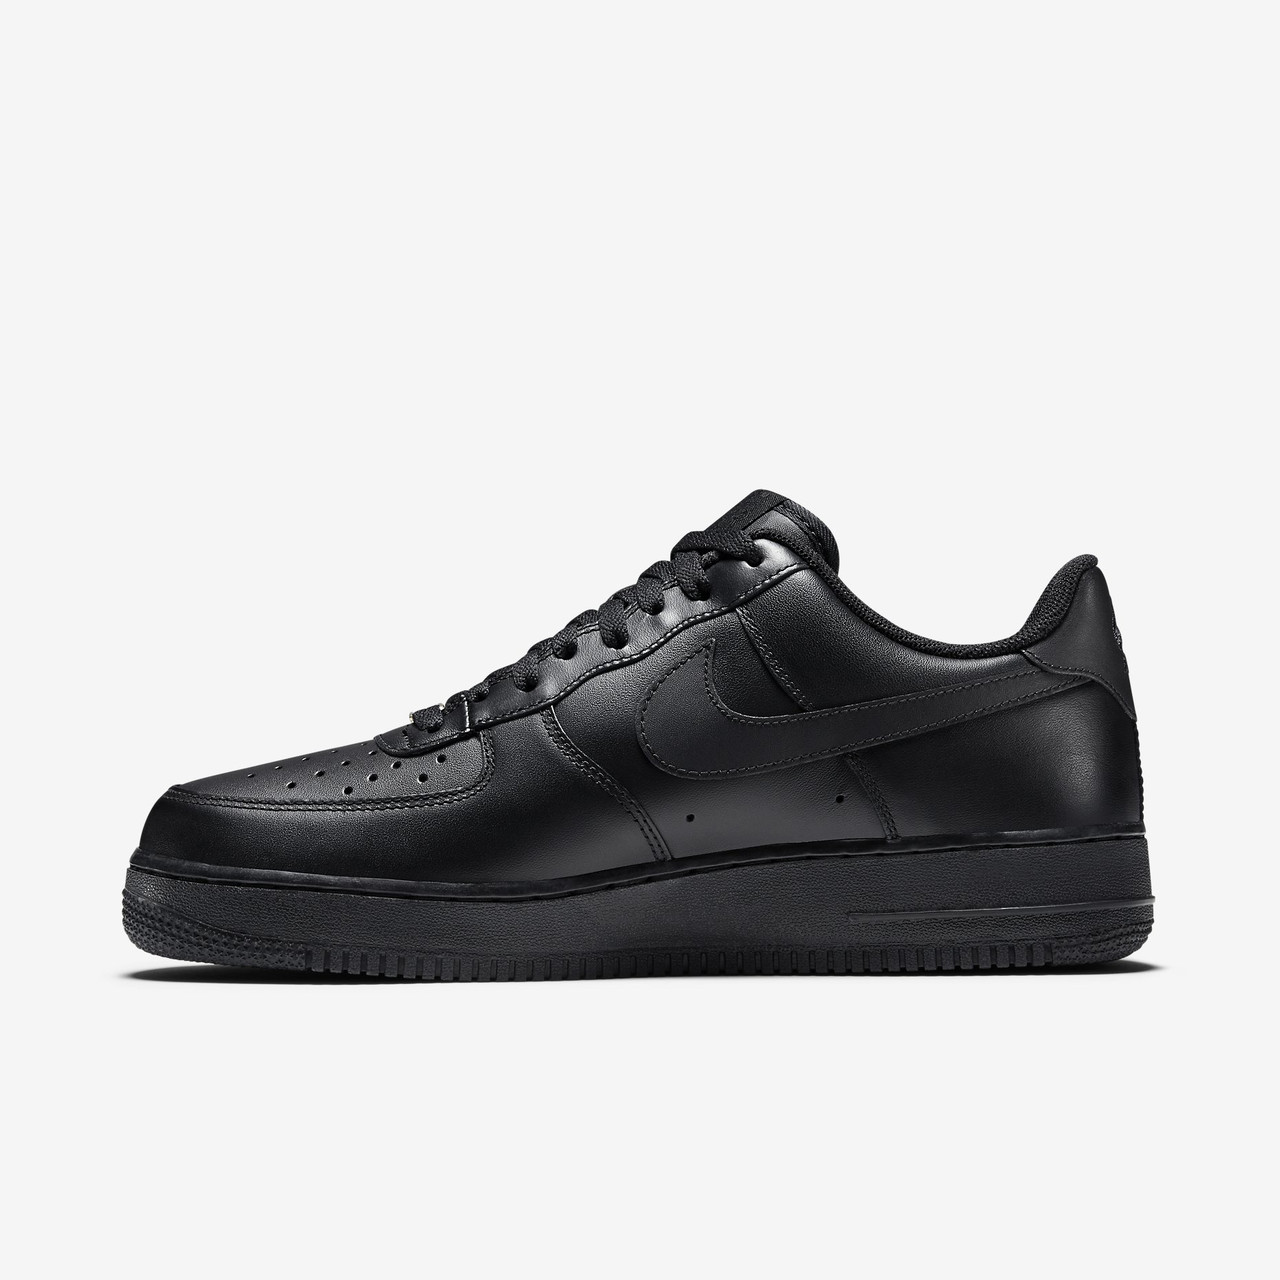 Мужские кроссовки Nike AIR FORCE 1 07 (Артикул: 315122-001)